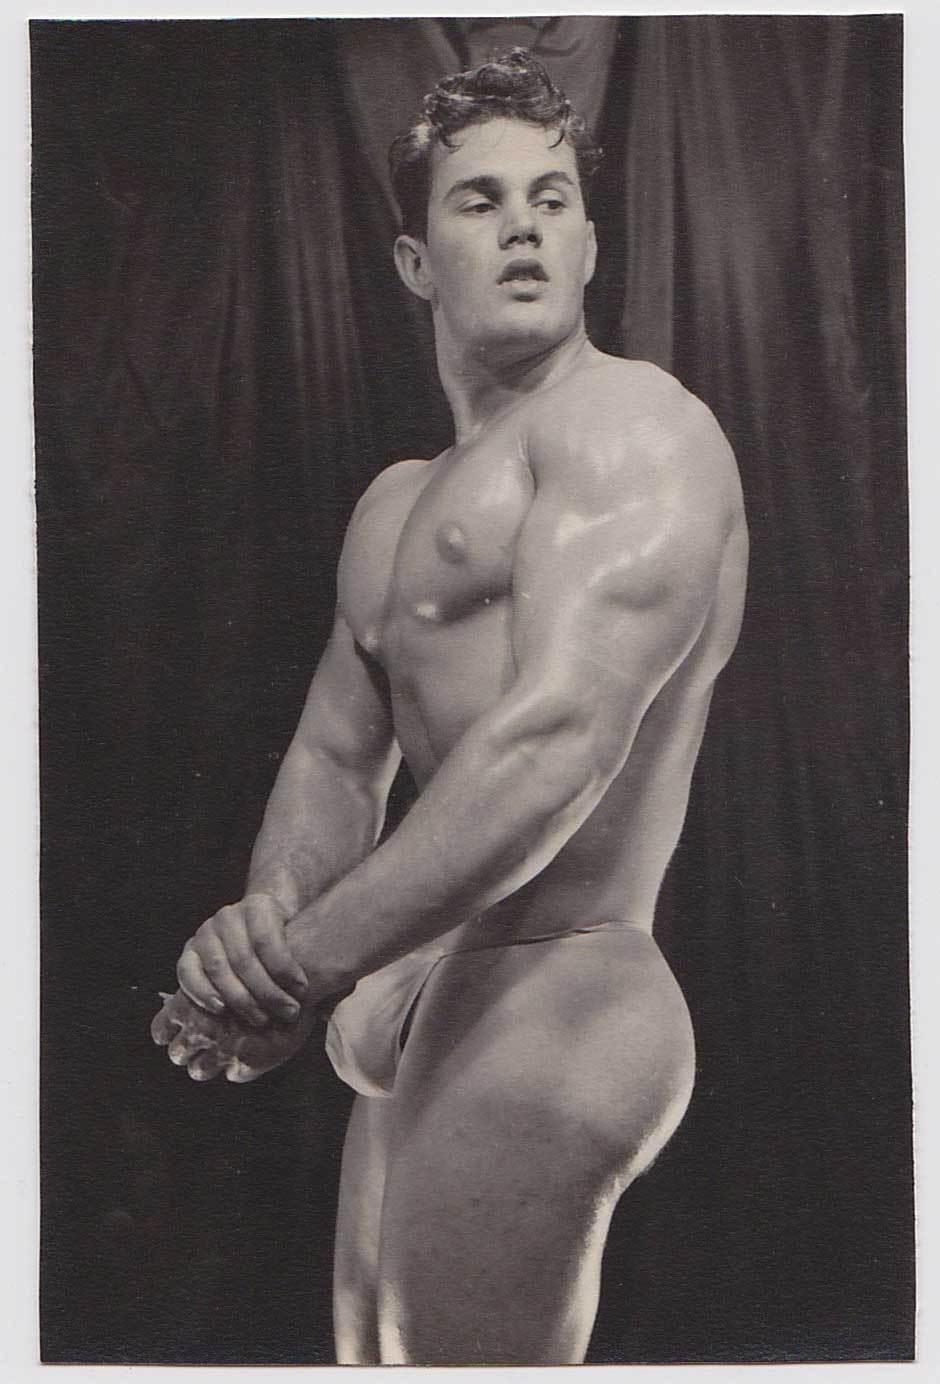 Male Models Vintage Beefcake-8192